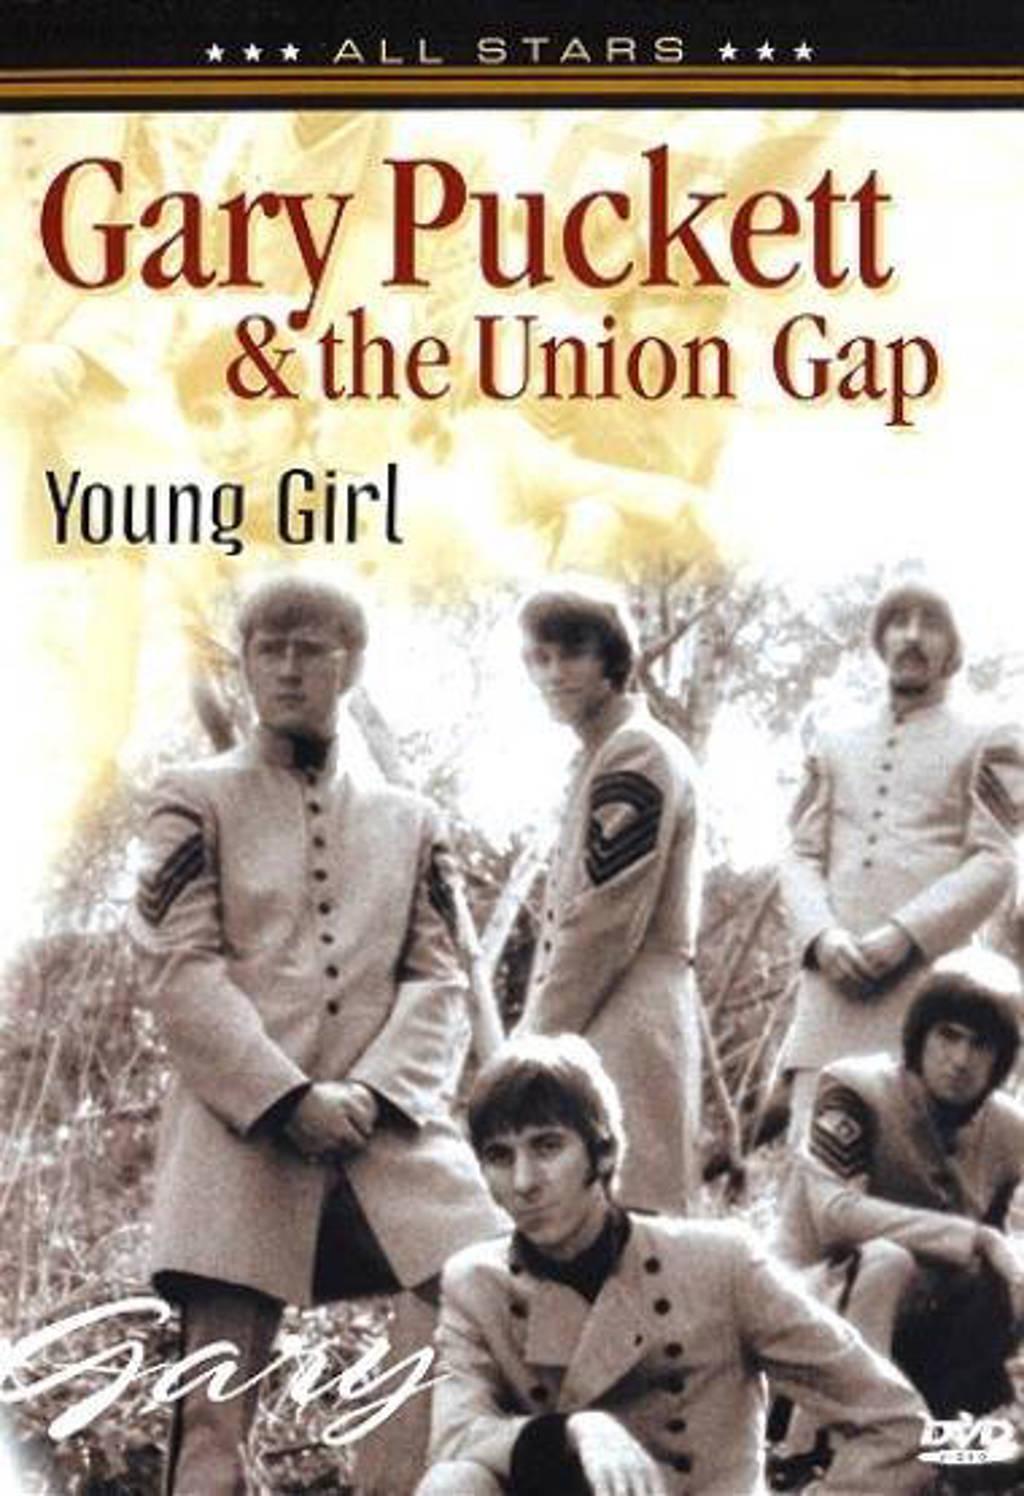 Gary puckett & the union gap - young girl (DVD)